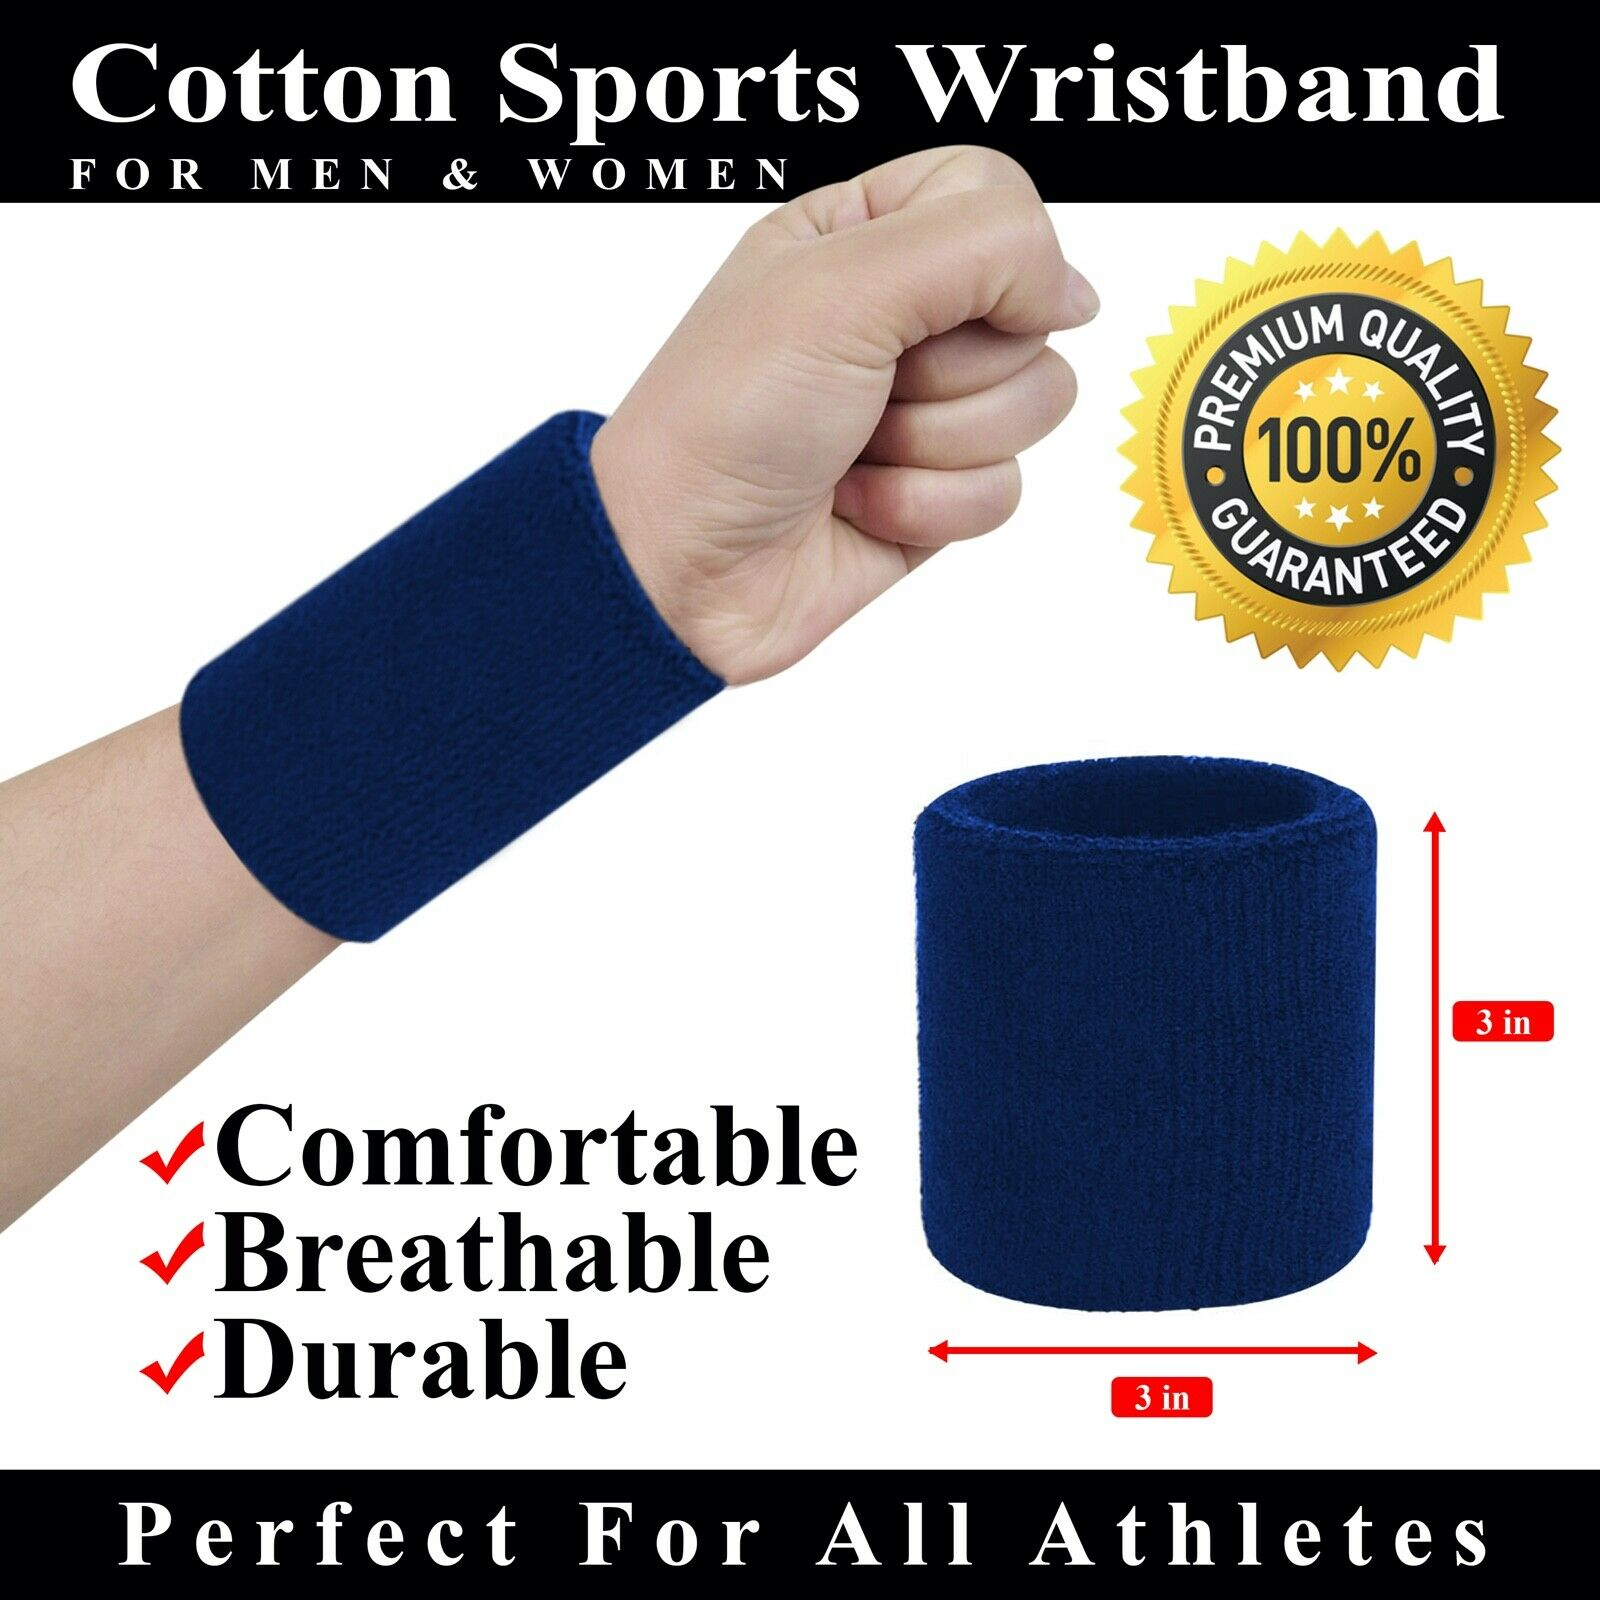 Small Sweat Wrist Bands Tennis Squash Sports MOTOGP for sale | eBay